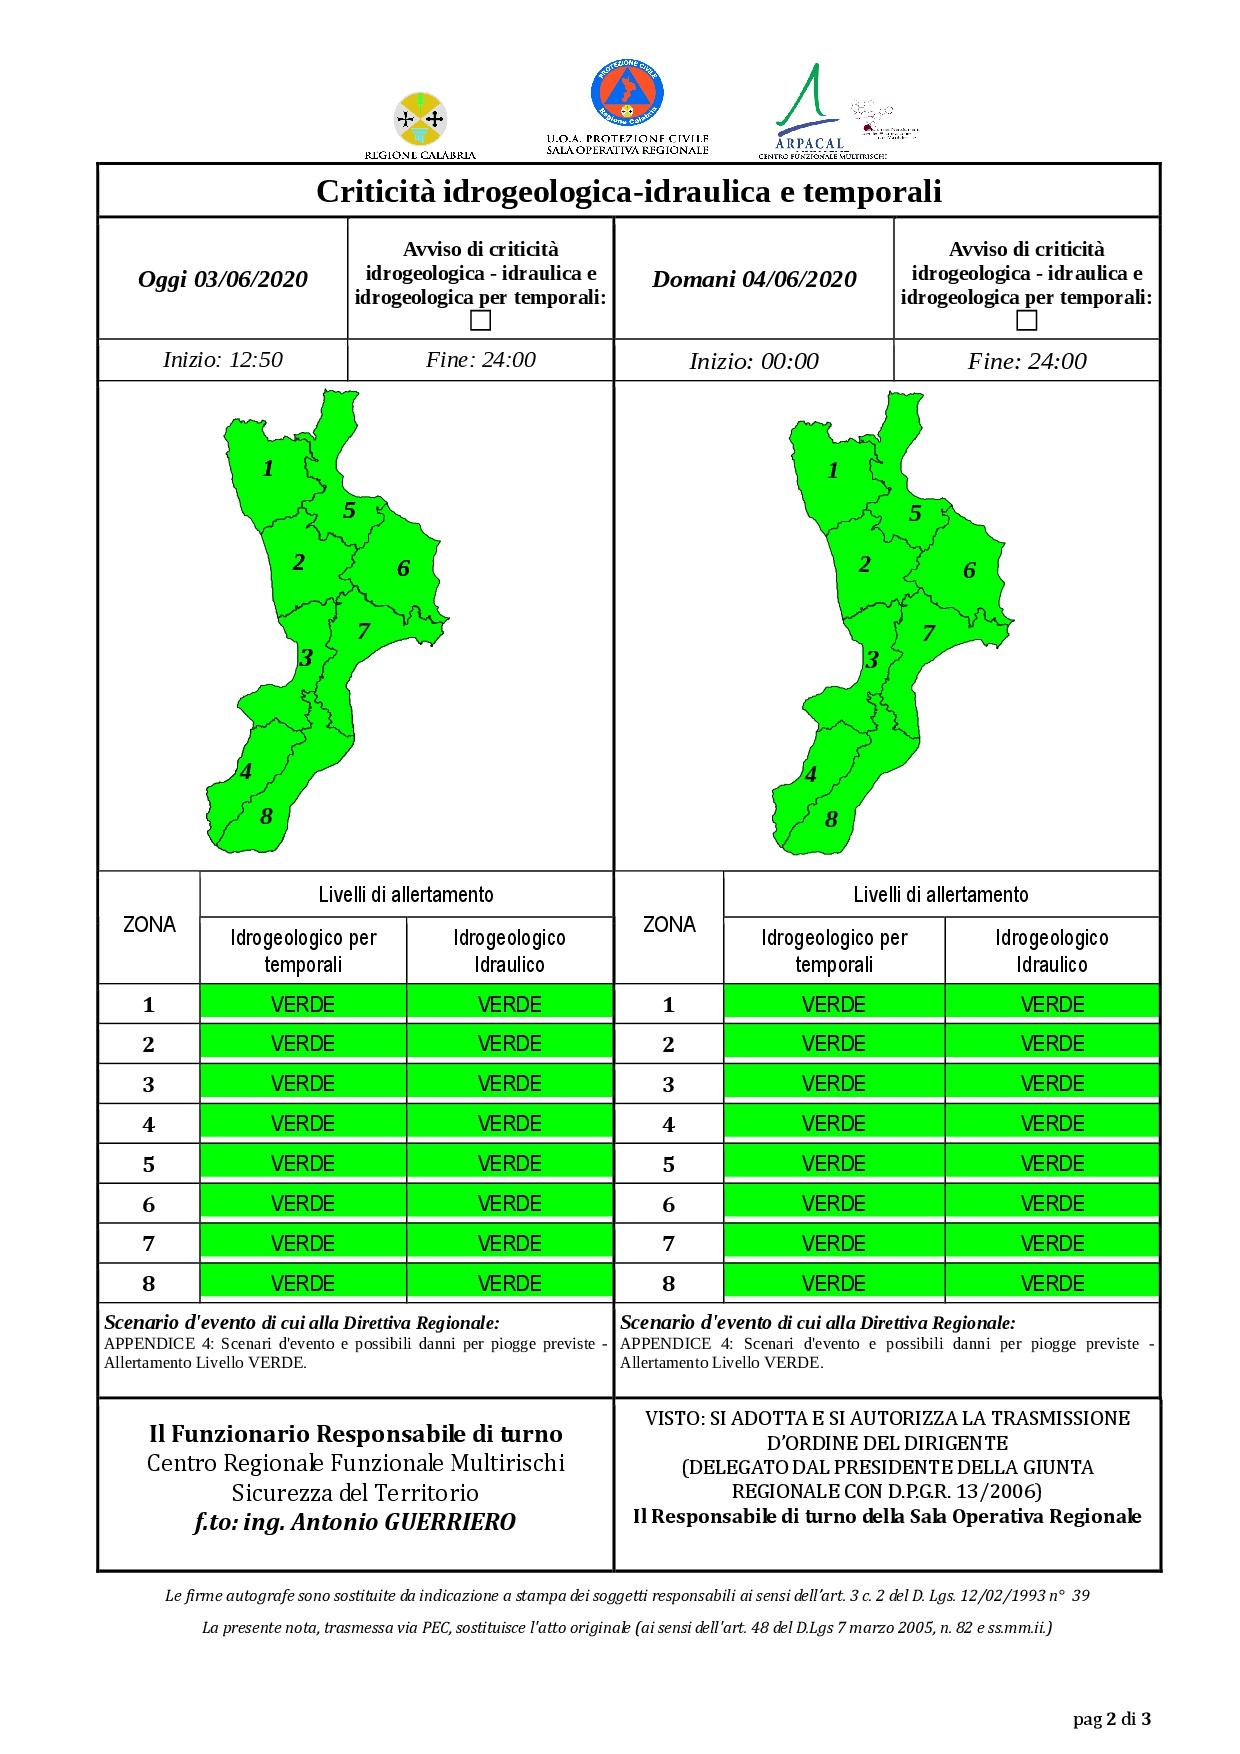 Criticità idrogeologica-idraulica e temporali in Calabria 03-06-2020